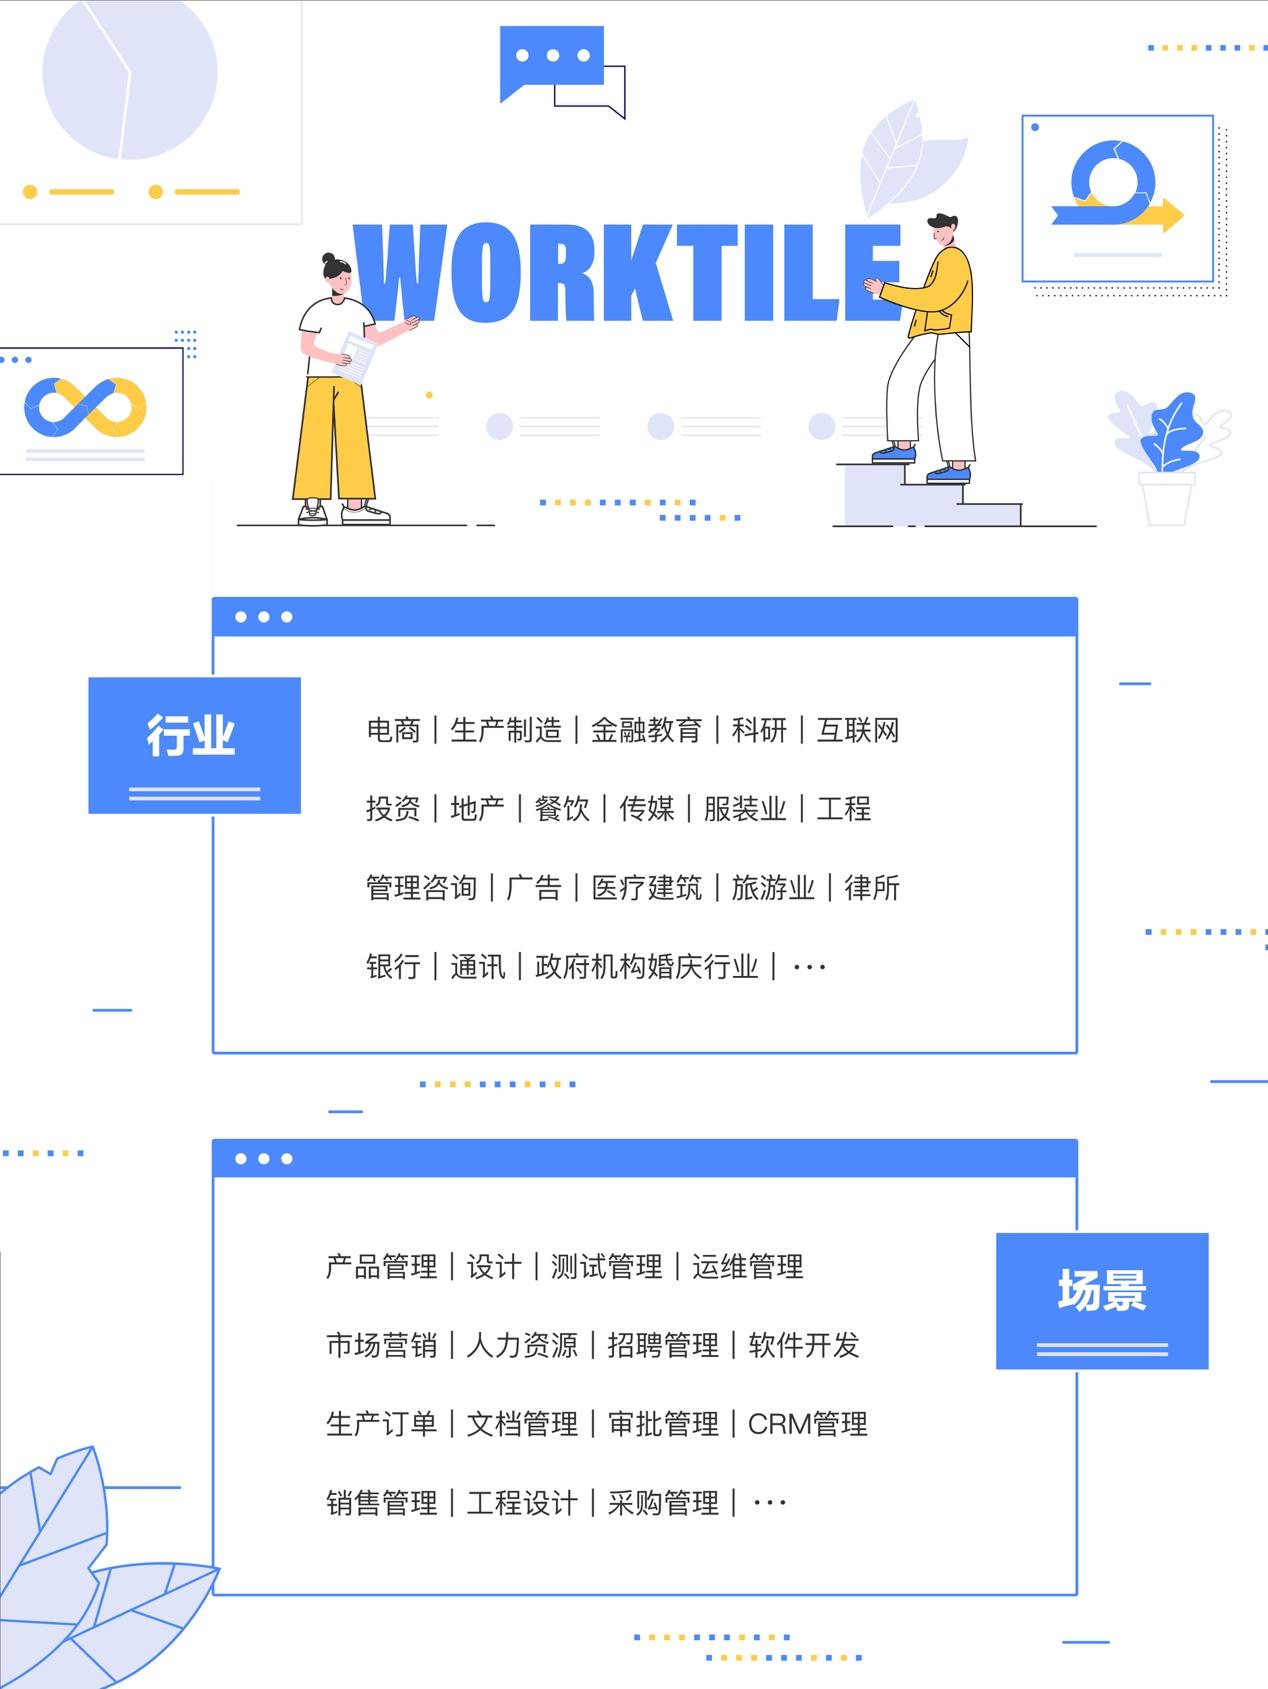 Worktile进军软件开发与协作的初心与野心